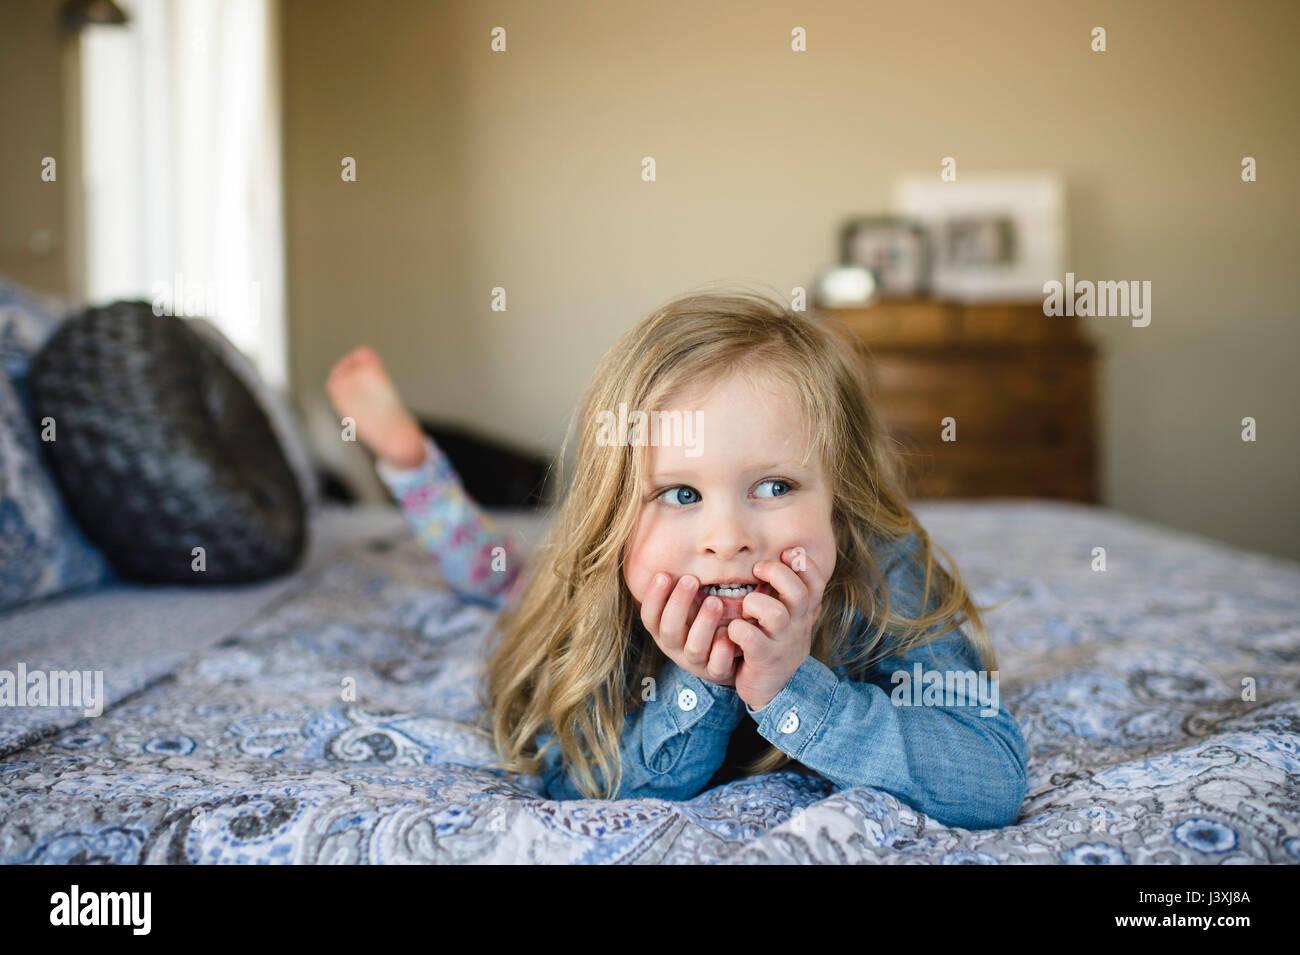 Girl lying on bed looking sideways Stock Photo